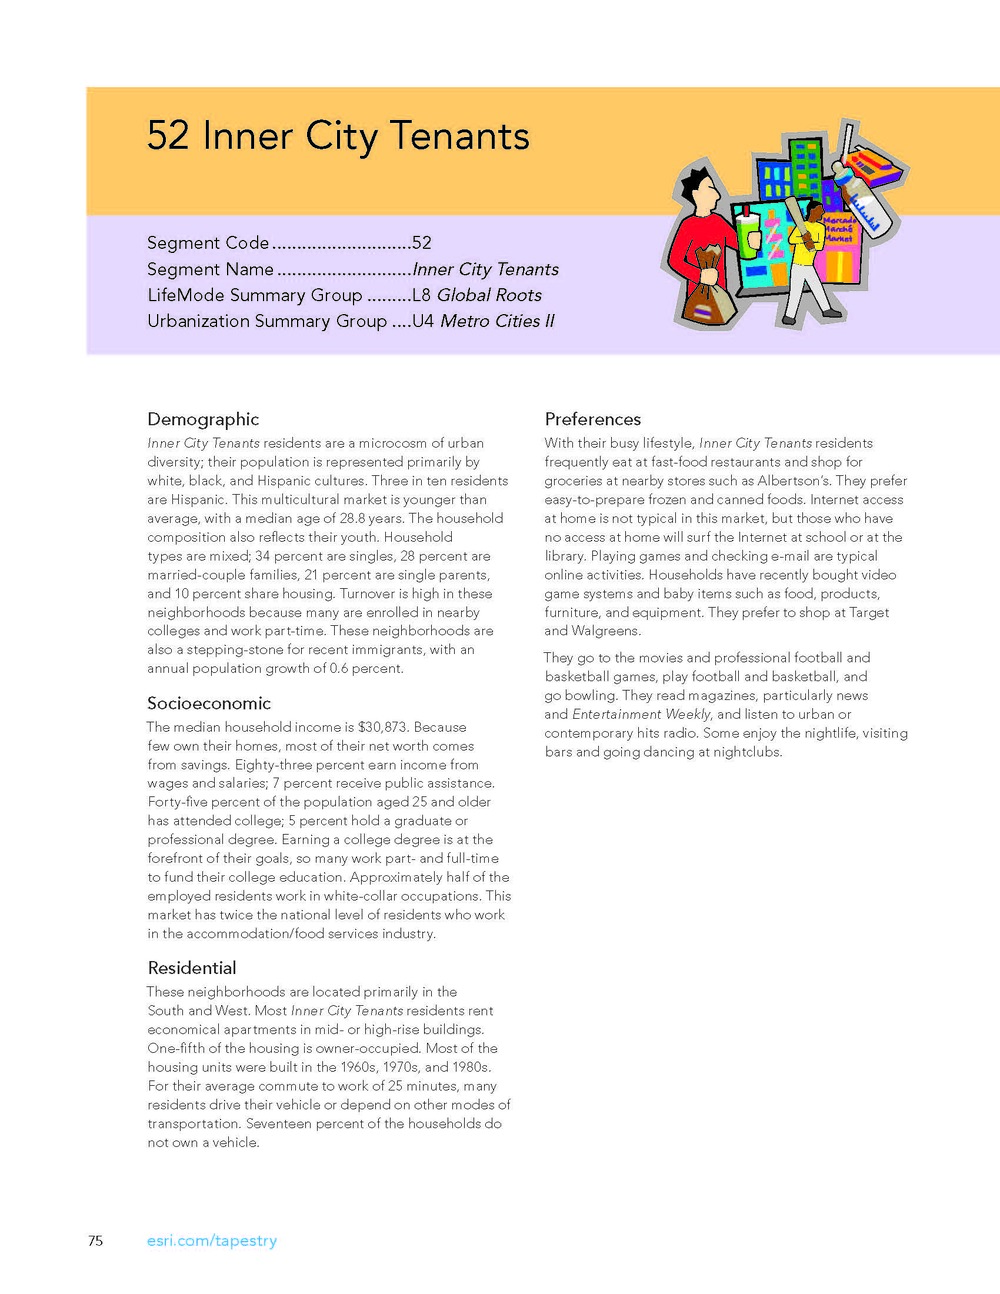 tapestry-segmentation_Page_78.jpg